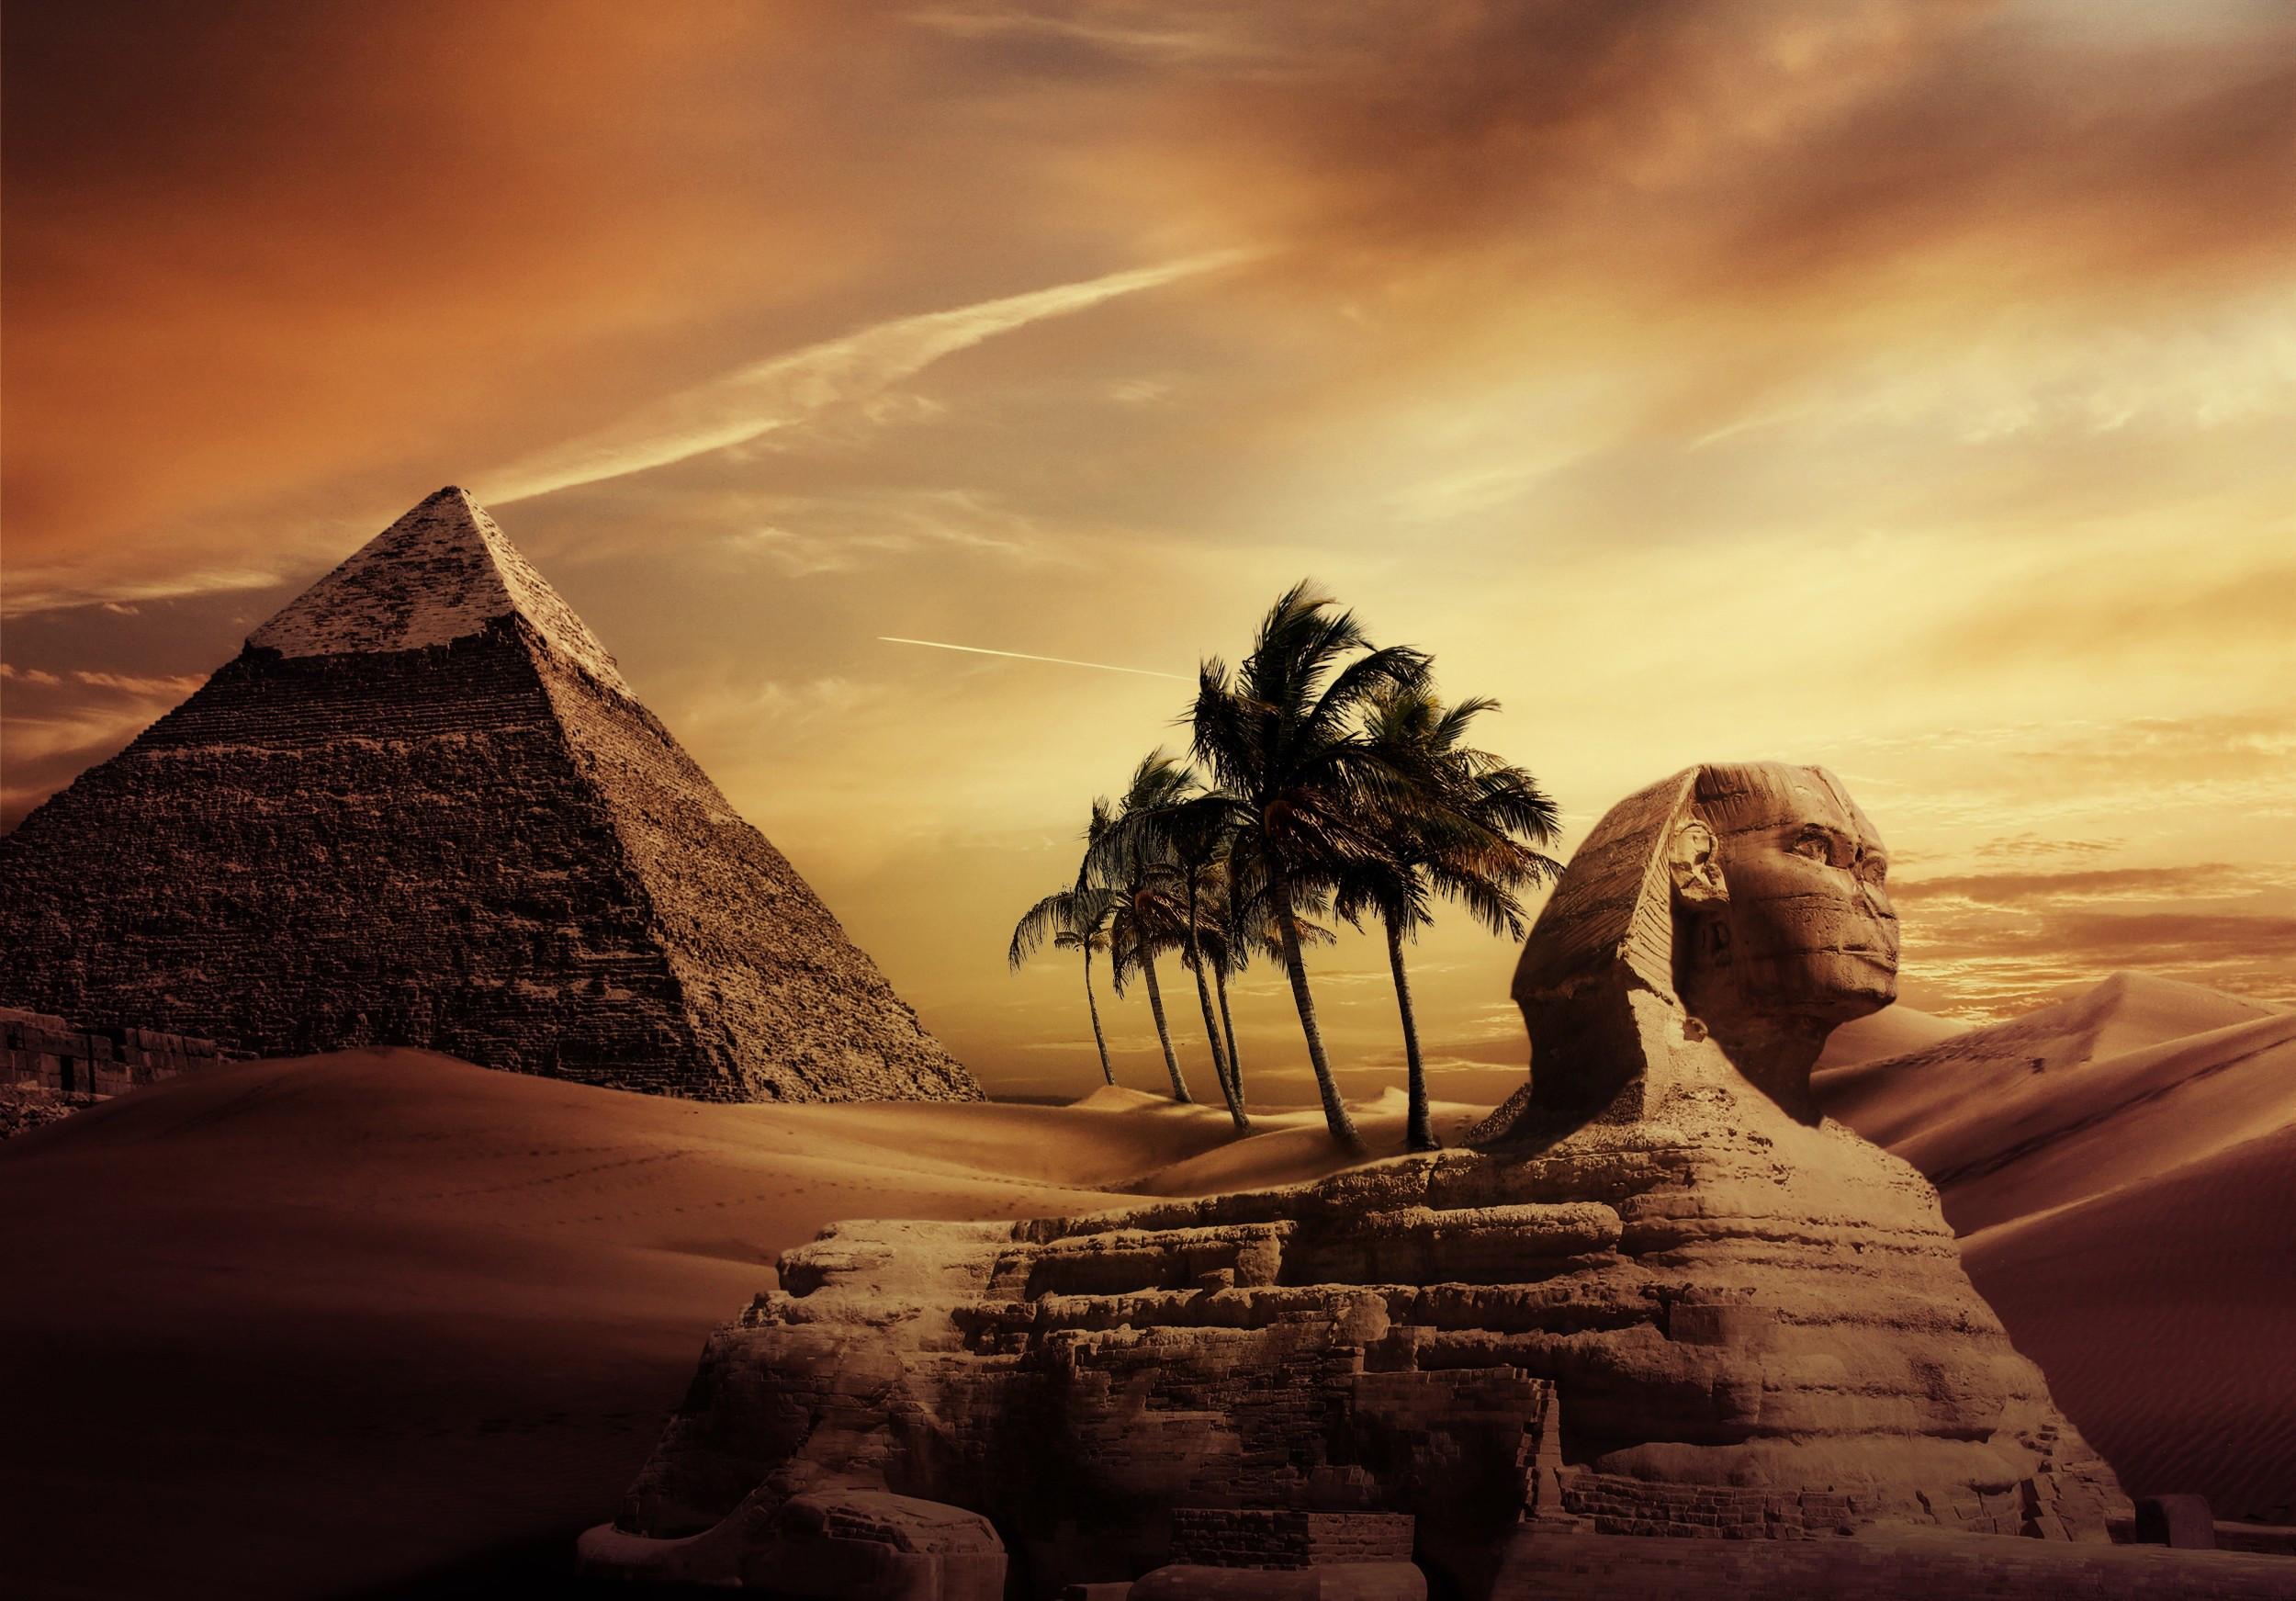 wallpaper.wiki-Desktop-Egypt-Pictures-PIC-WPB007002